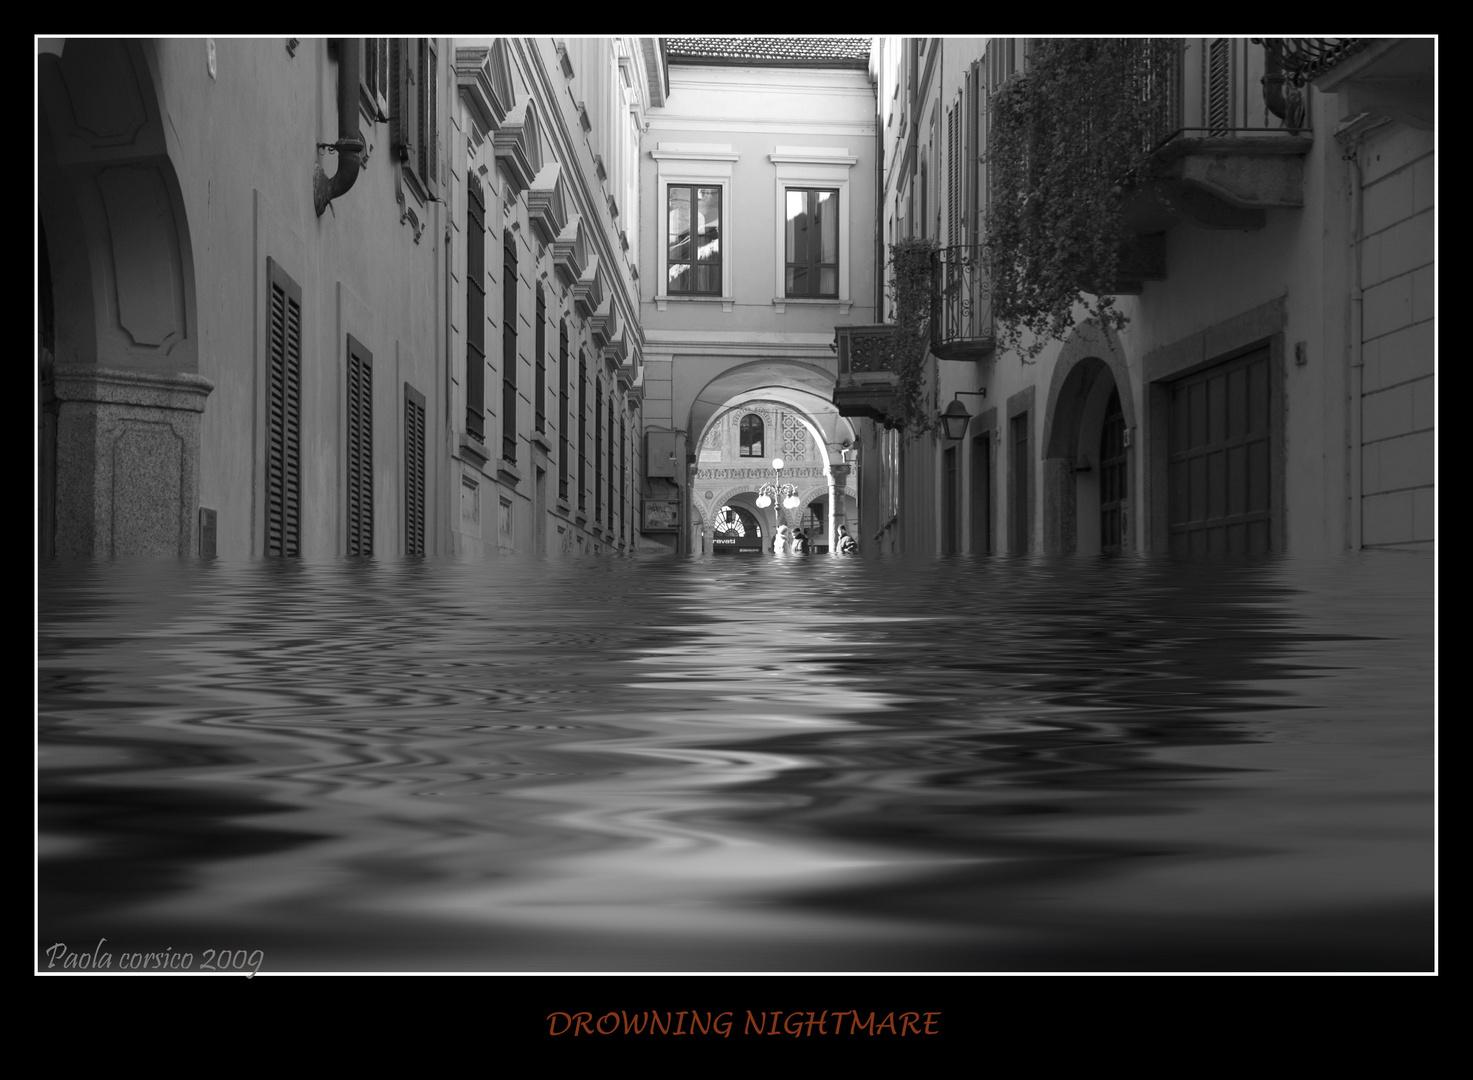 La città sommersa - (Drowning nightmare)